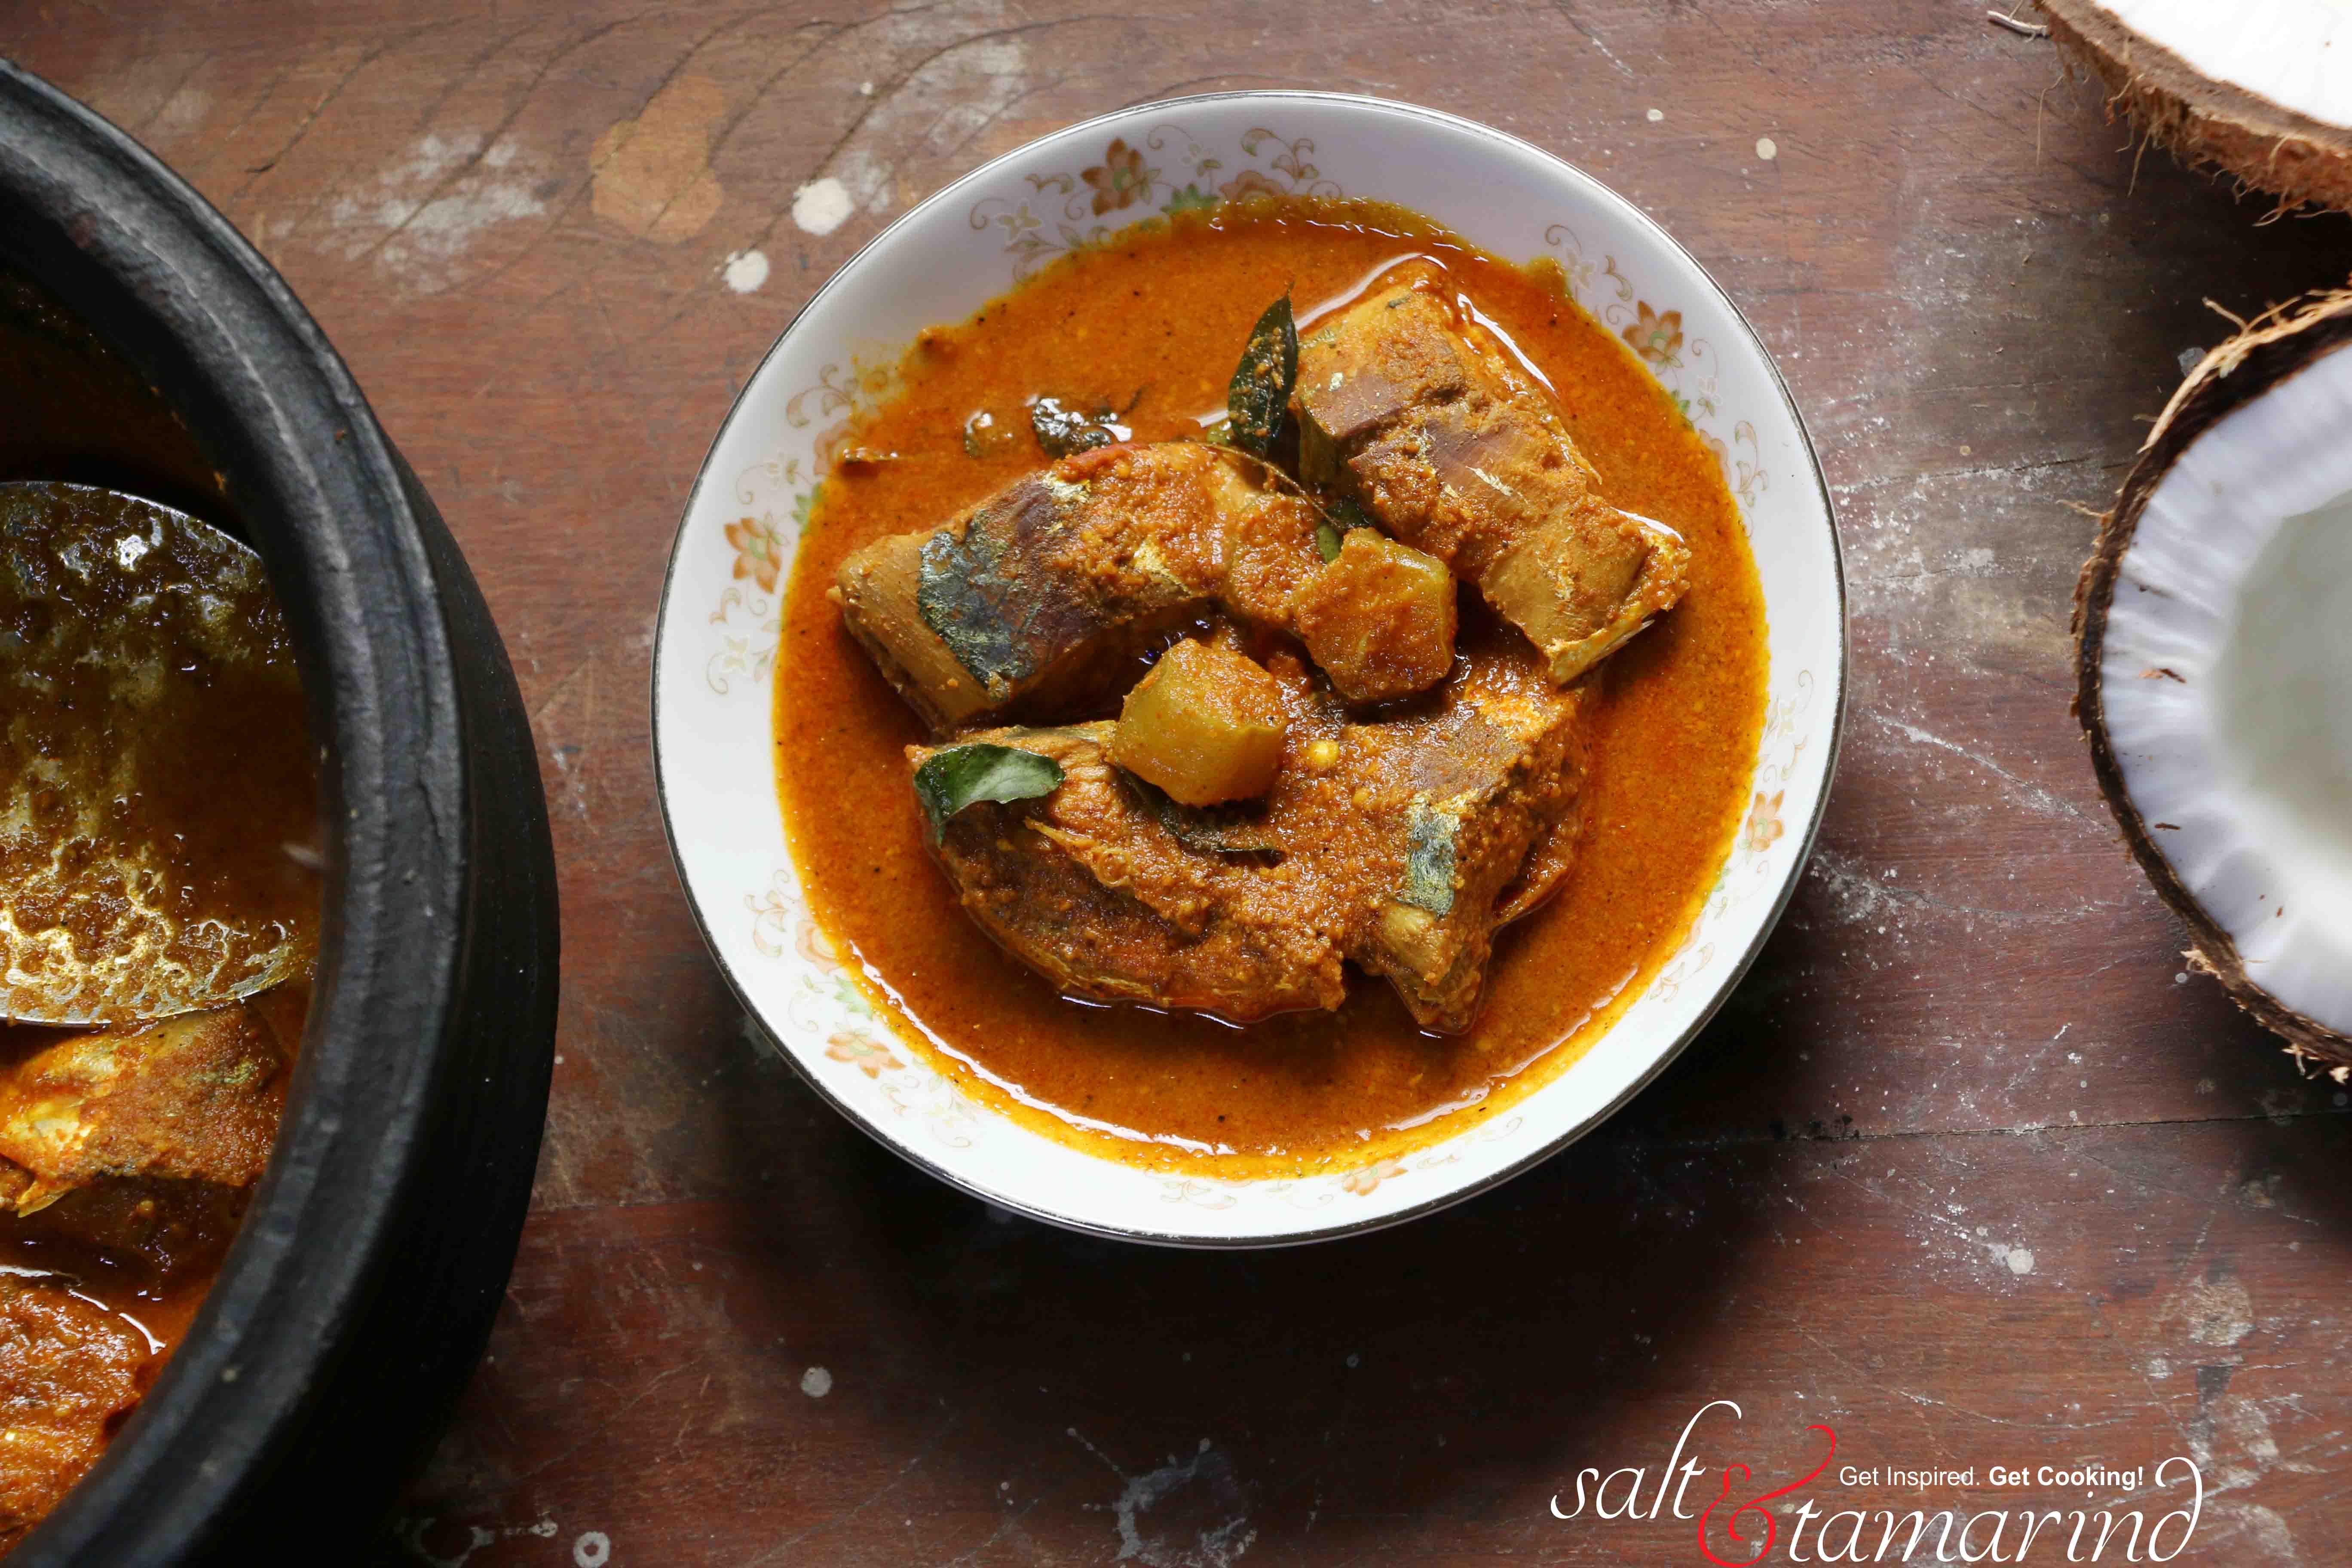 Varutharacha (Roasted Coconut) Fish Curry